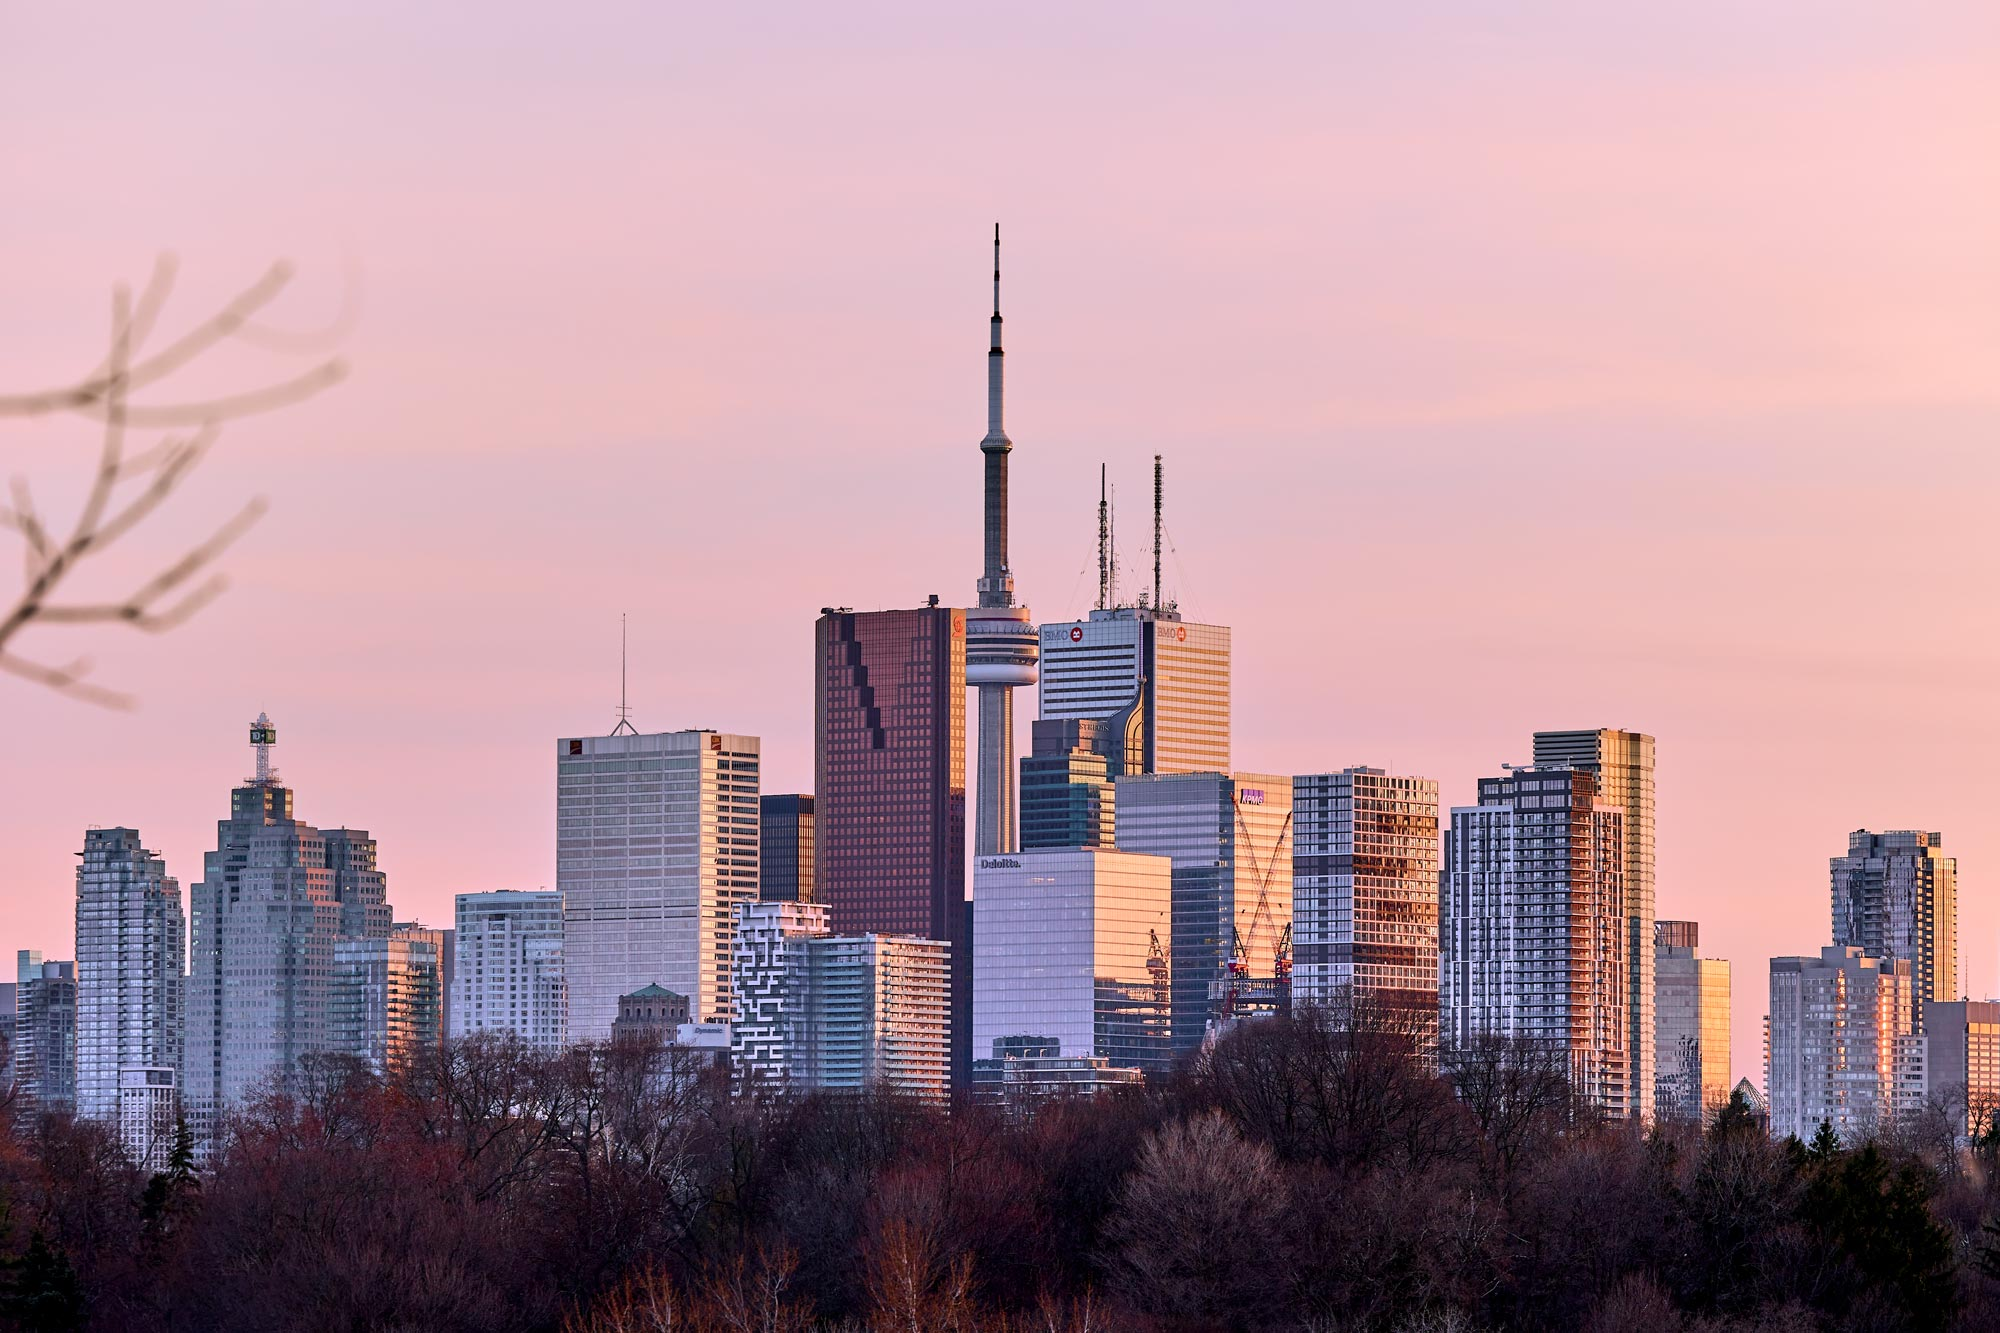 Toronto skyline during sunset